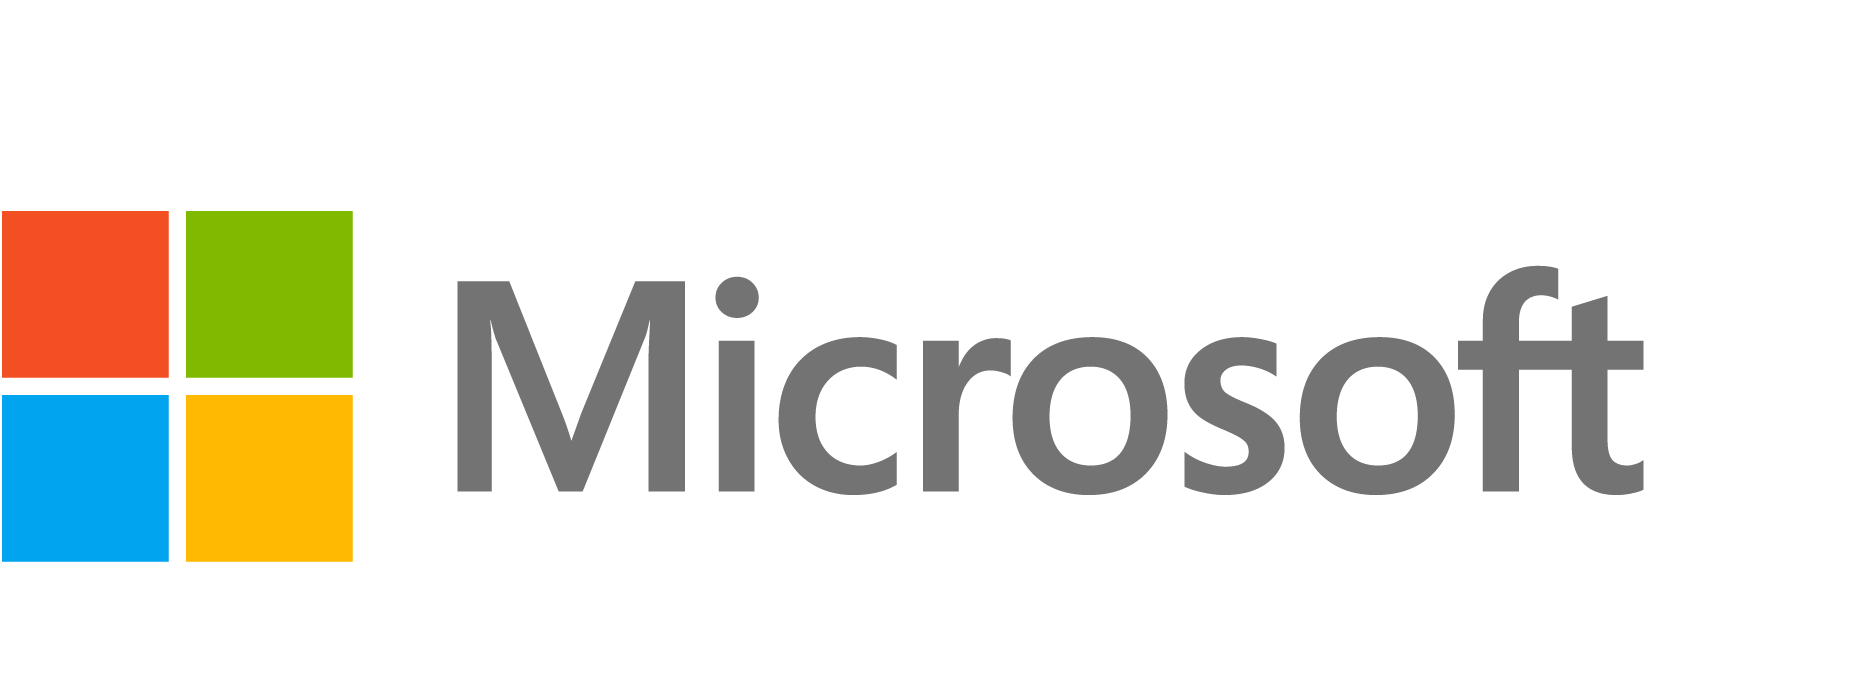 SQL Server Enterprise - 2 Core License Pack - 1 year (DG7GMGF0FKZV)